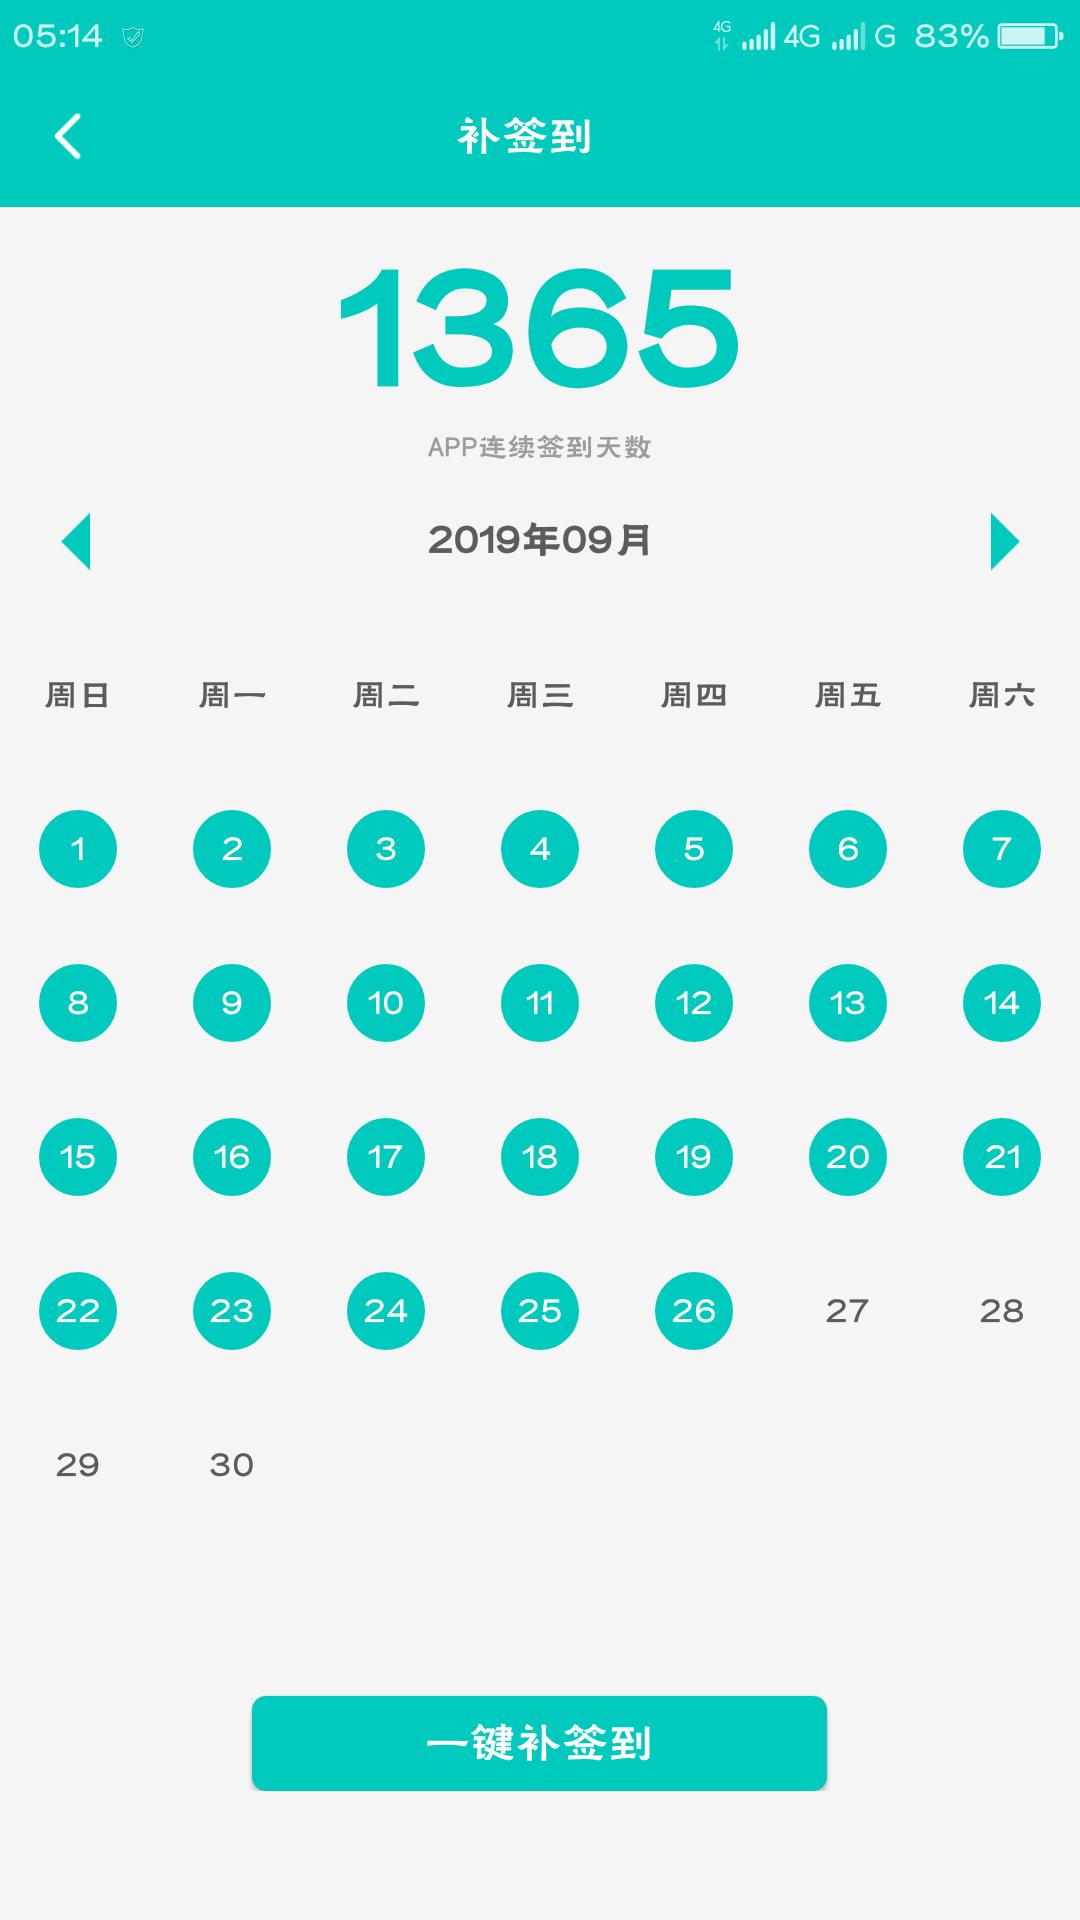 Screenshot_2019-09-26-05-14-44.png